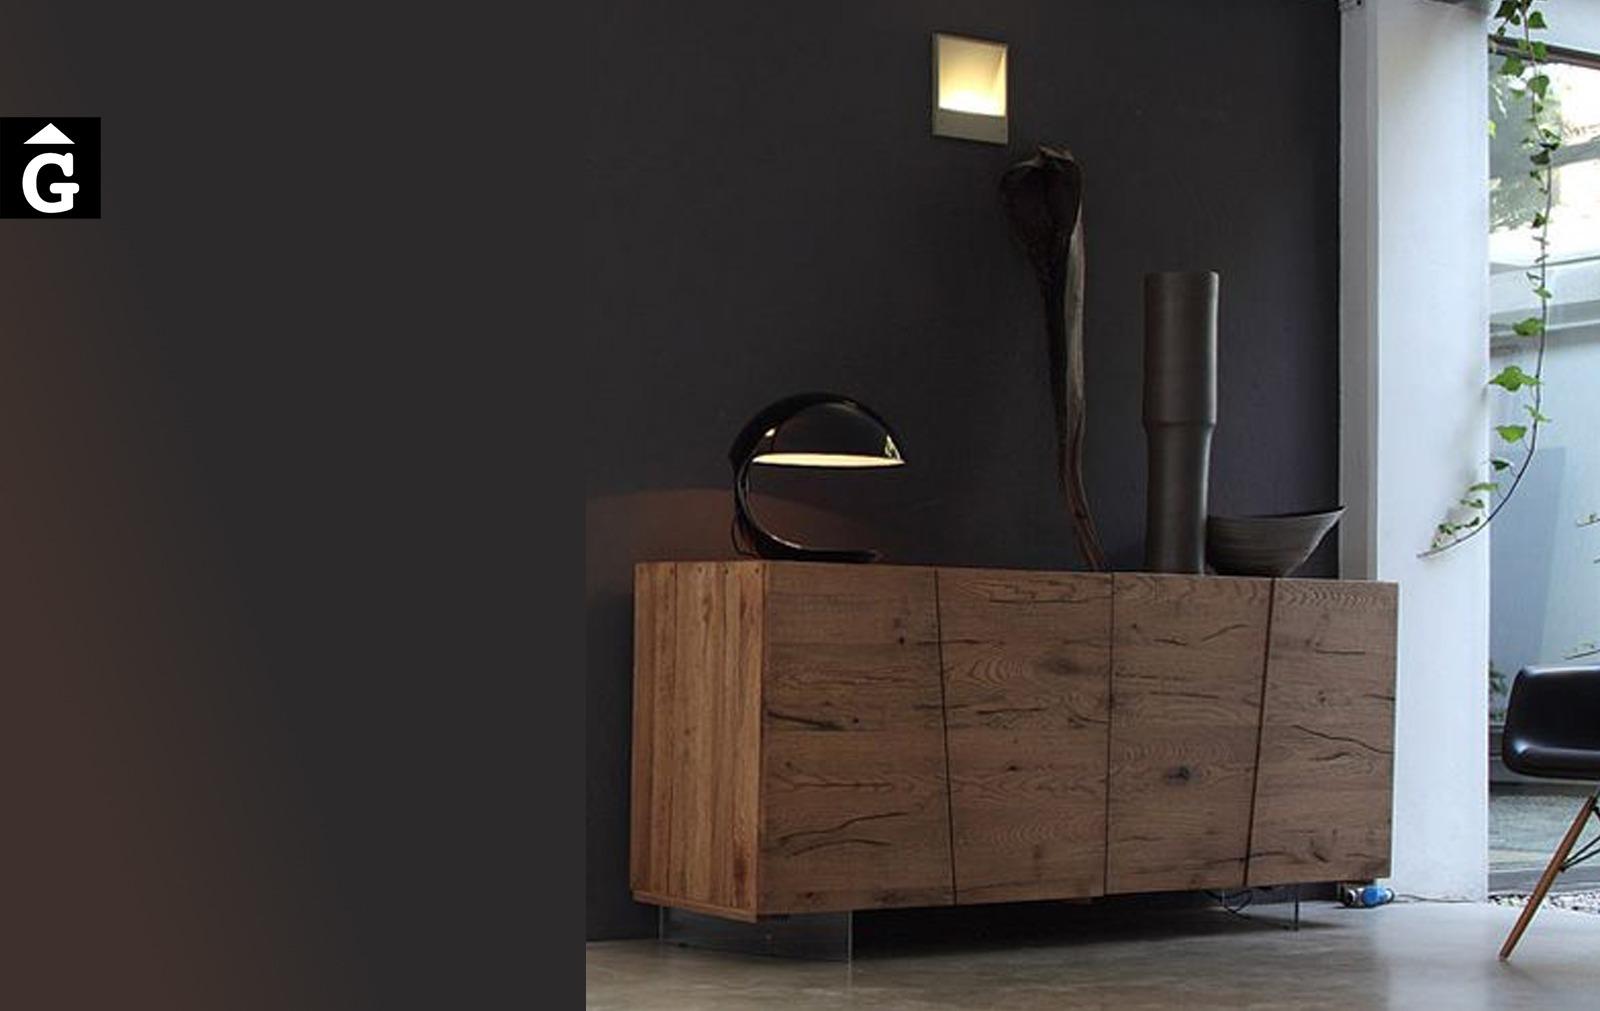 Moble bufet massis Unika M15 Devina Nais by mobles Gifreu moble massis roure disseny actual extremat qualitat premium